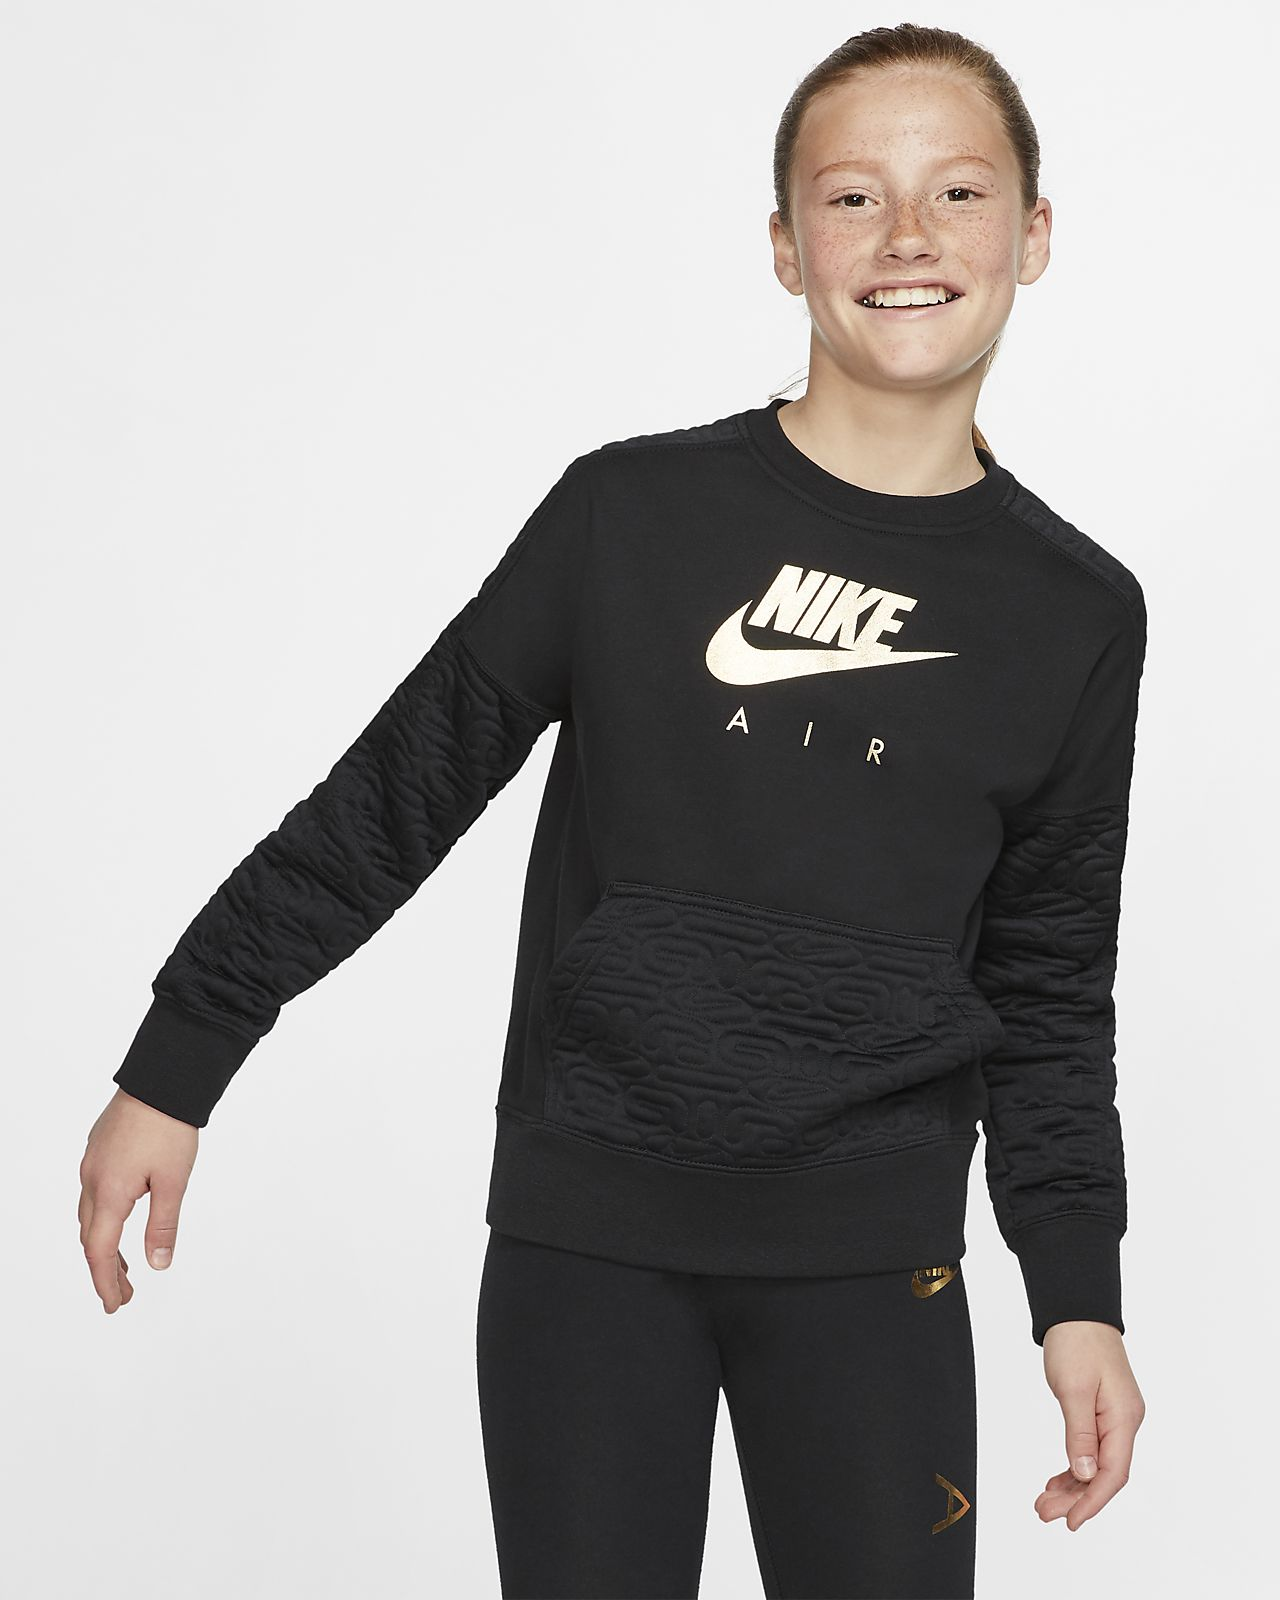 Nike Air Girls' Long-Sleeve Fleece Top